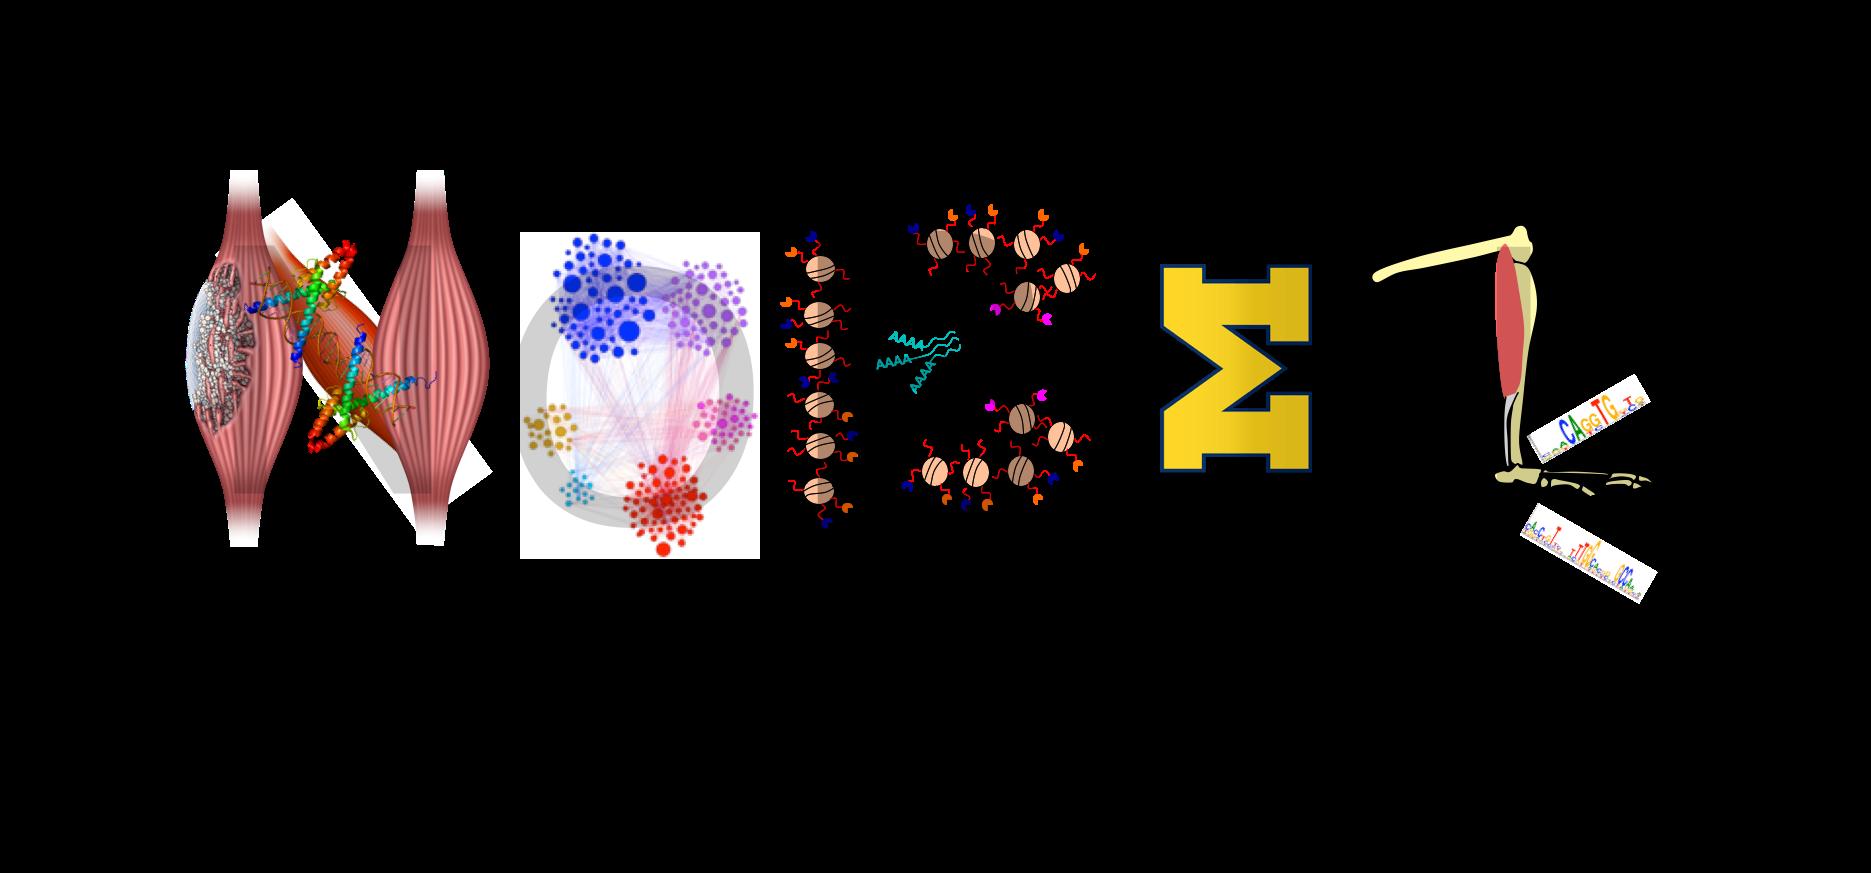 Website clipart welcome home sign. Nano omic bio engineering